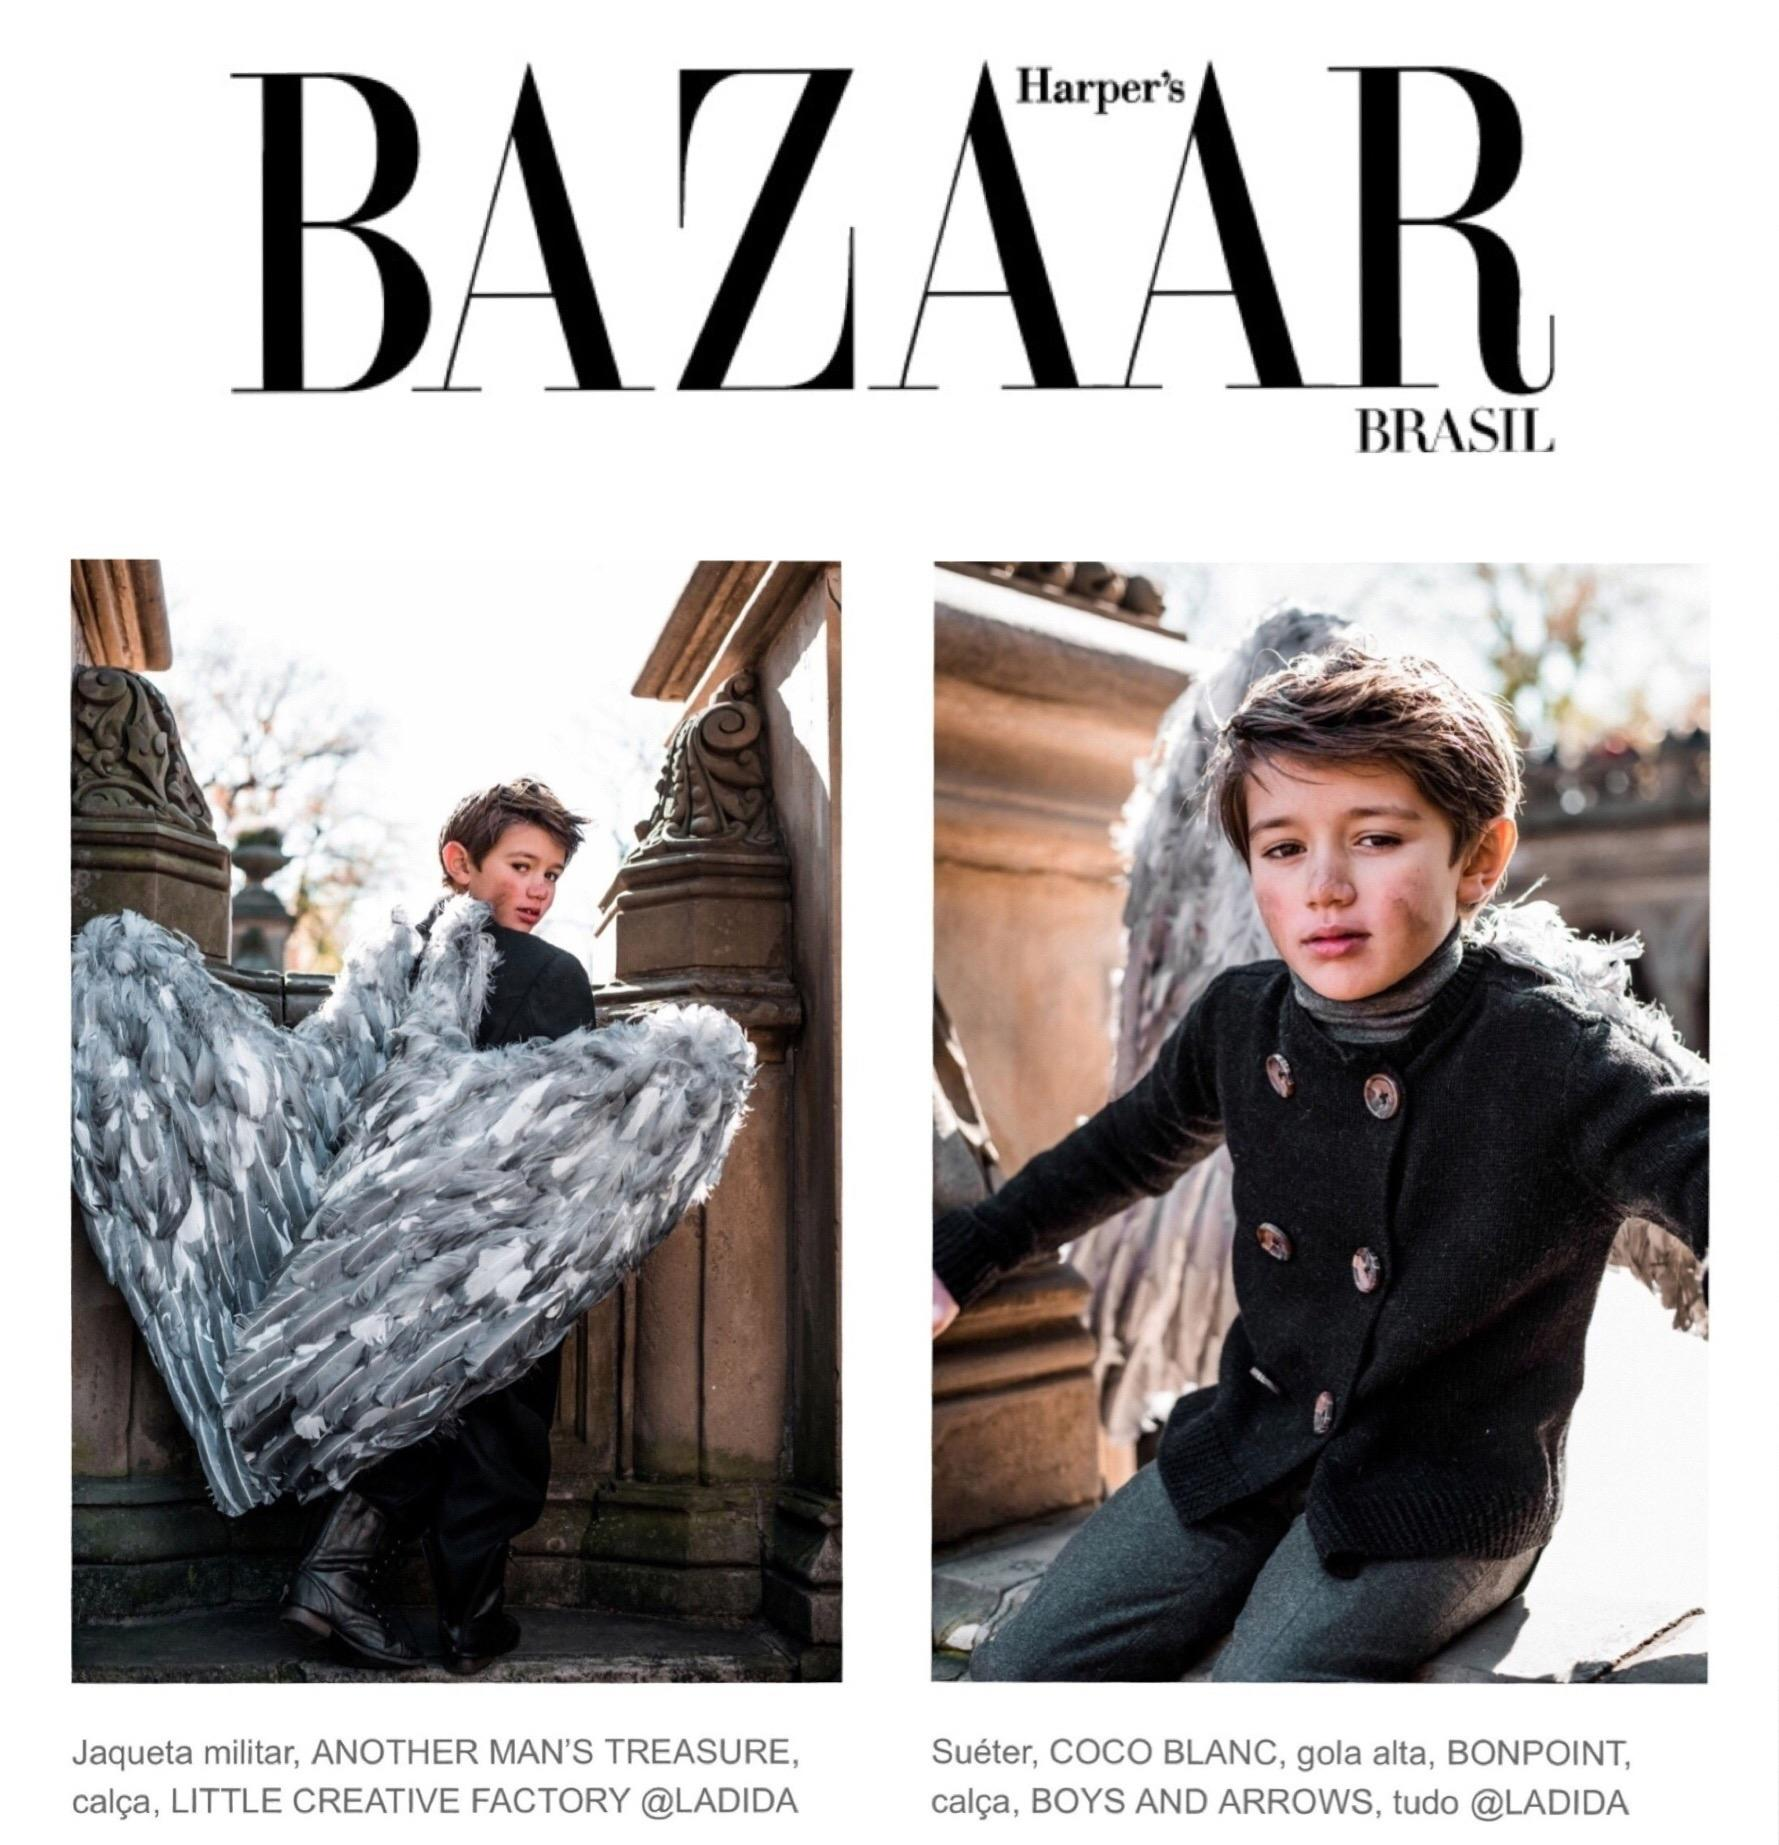 Melanee Kate - Harpers Bazzar